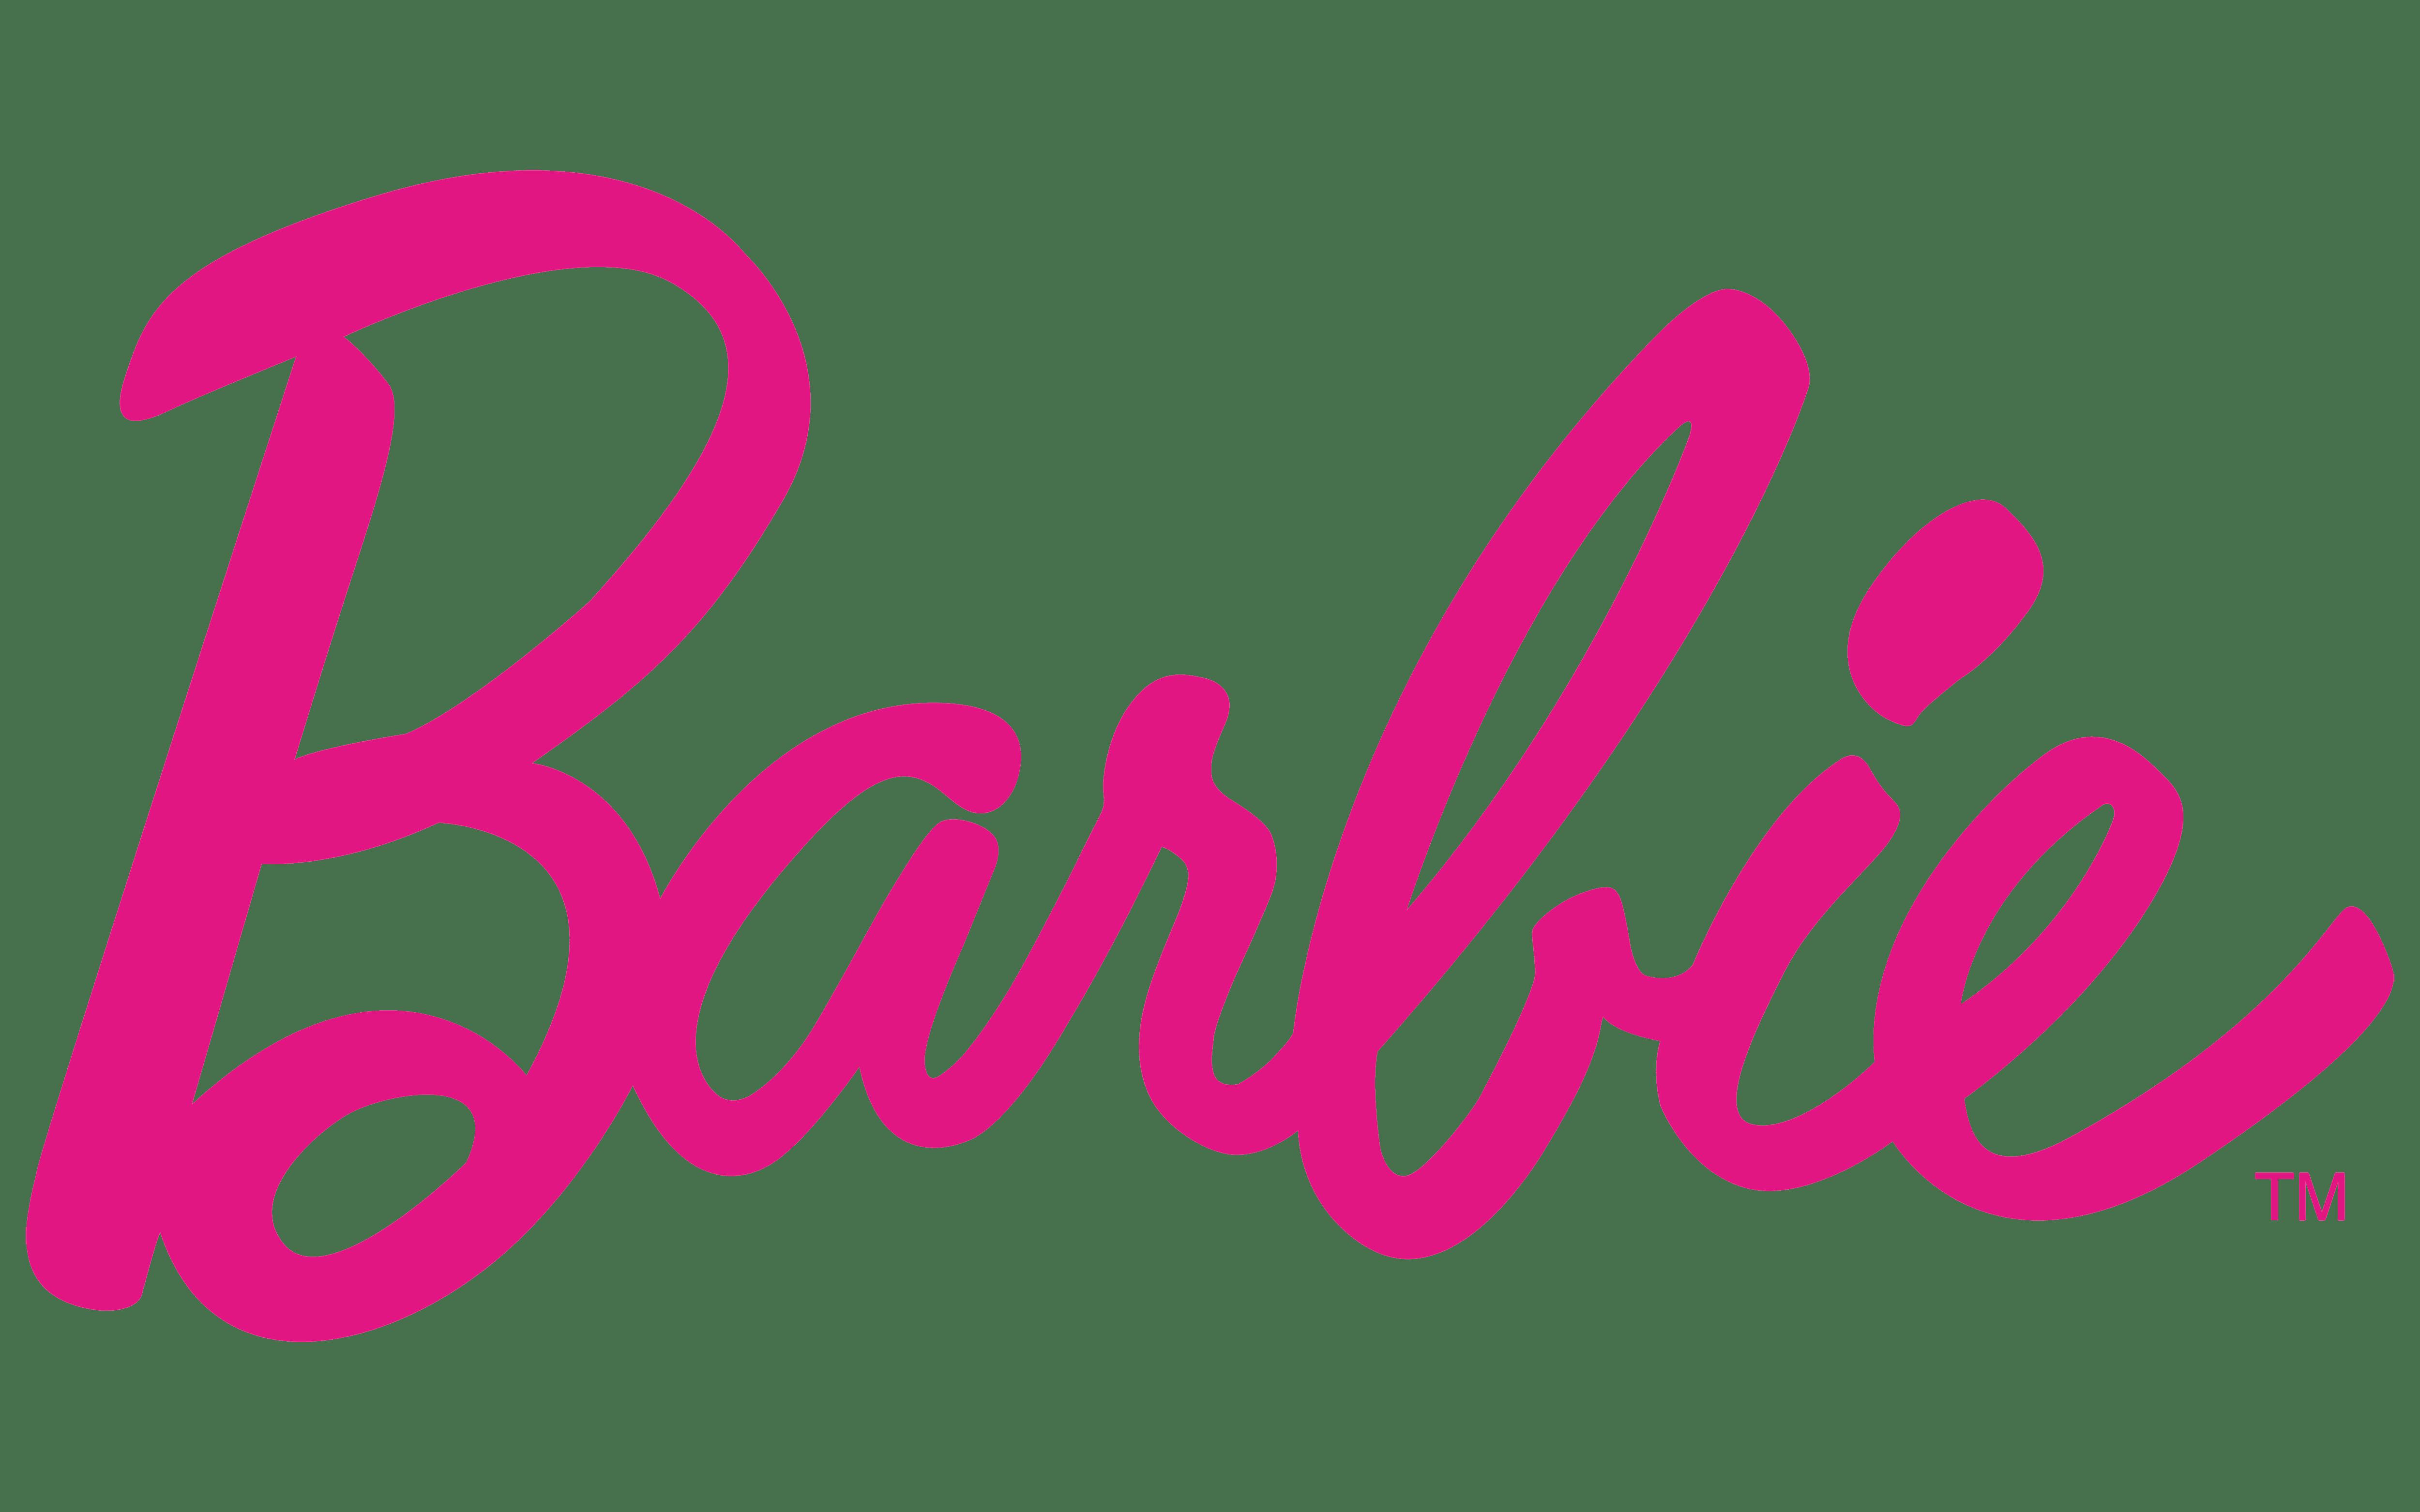 Barbie Logo Barbie Symbol Meaning History And Evolution